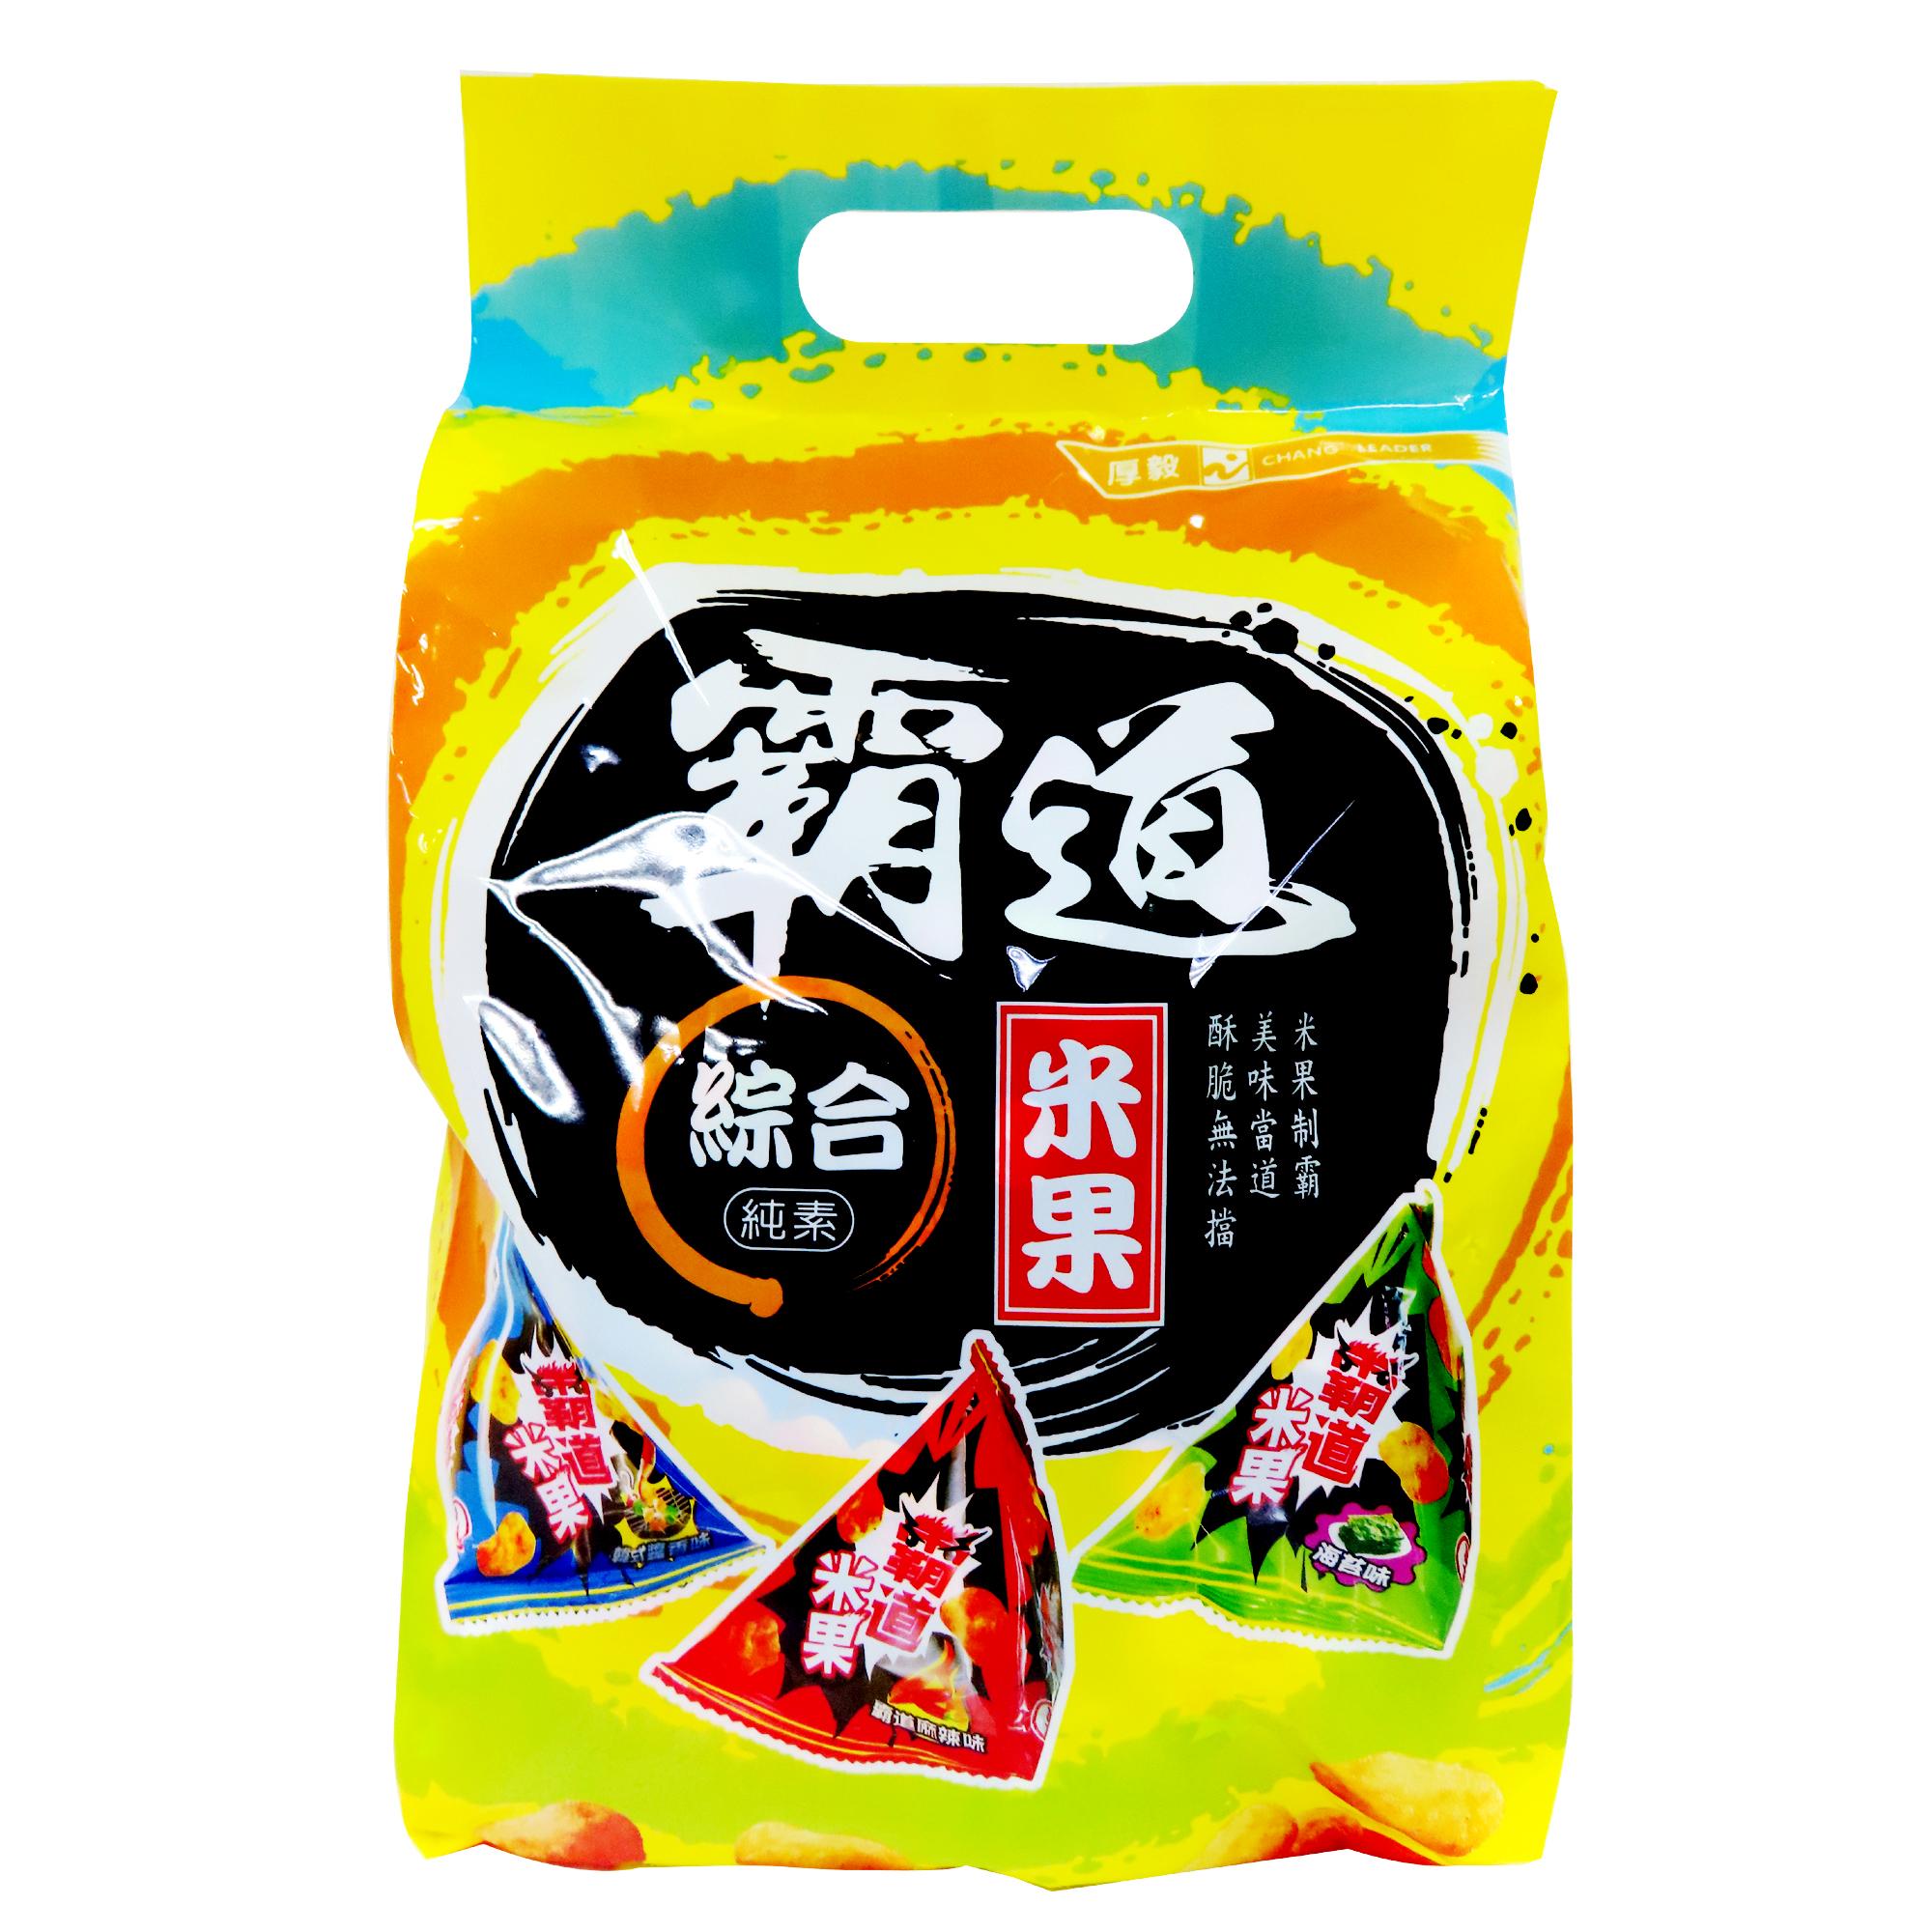 Image Multi Rice Crackers 霸道综合米果 450grams